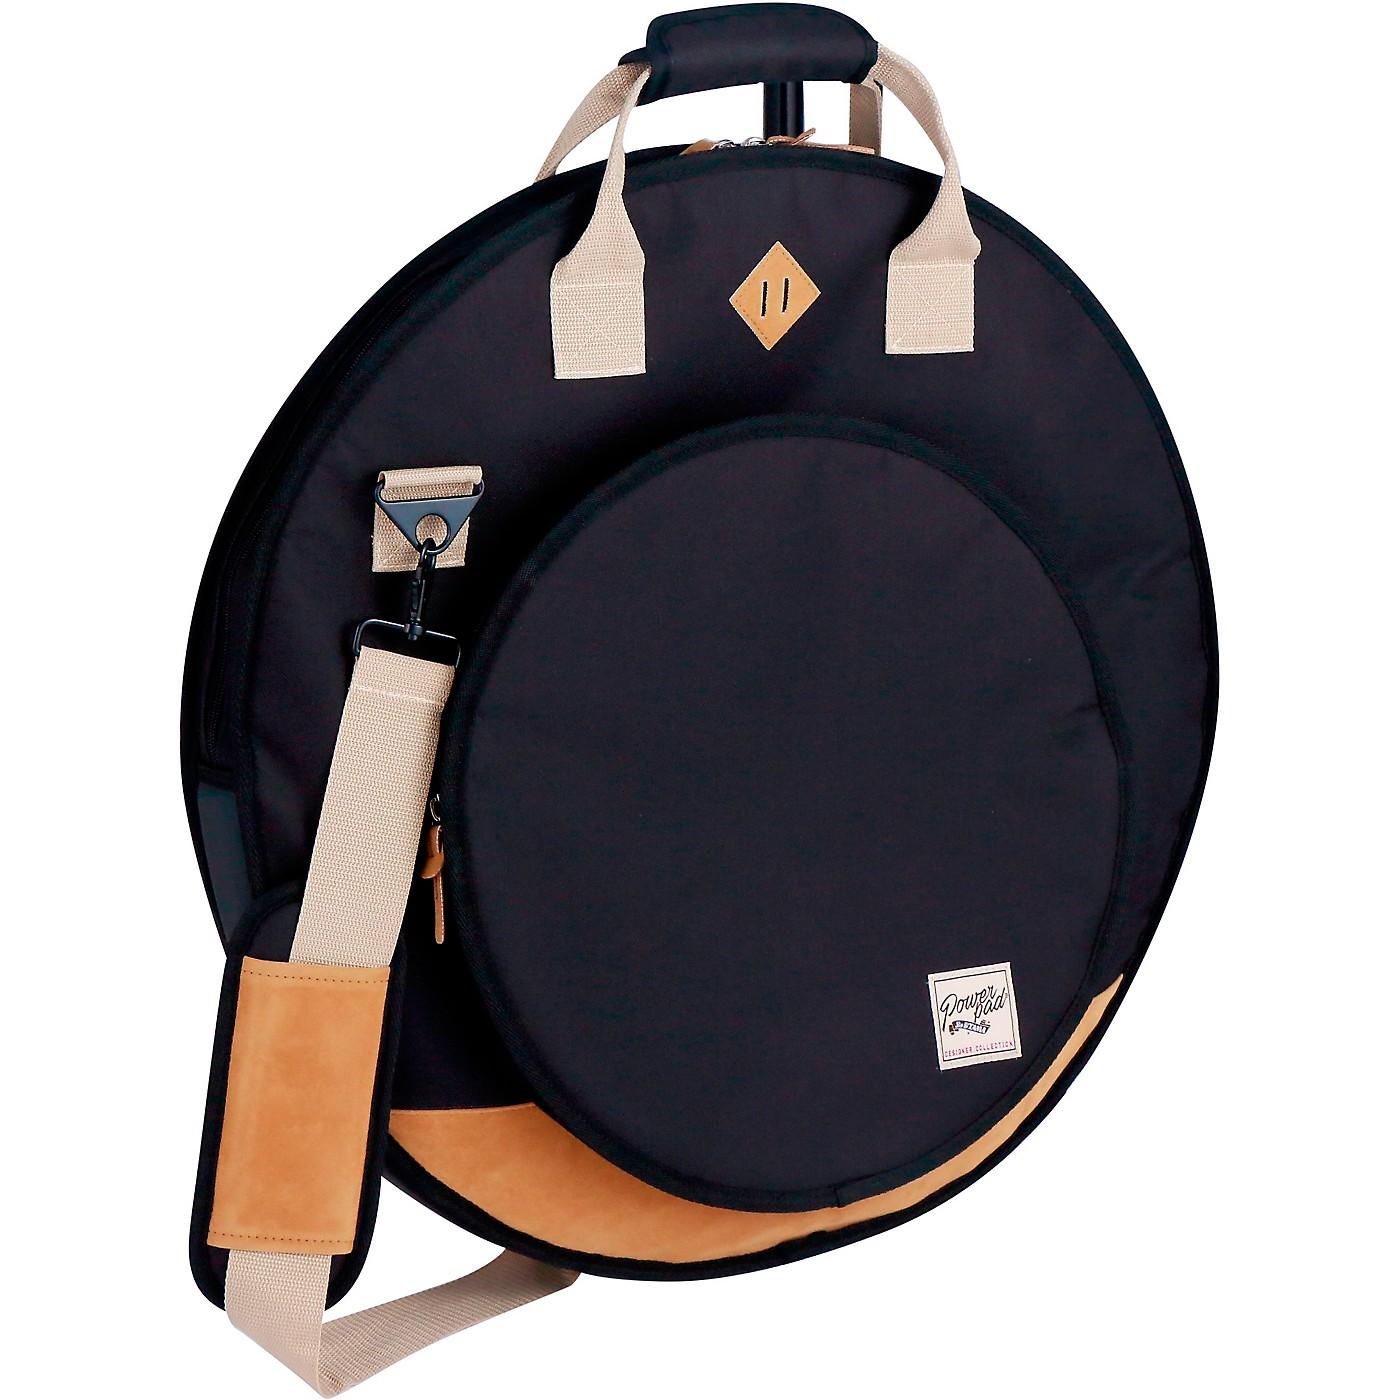 TAMA Powerpad Cymbal Bag thumbnail